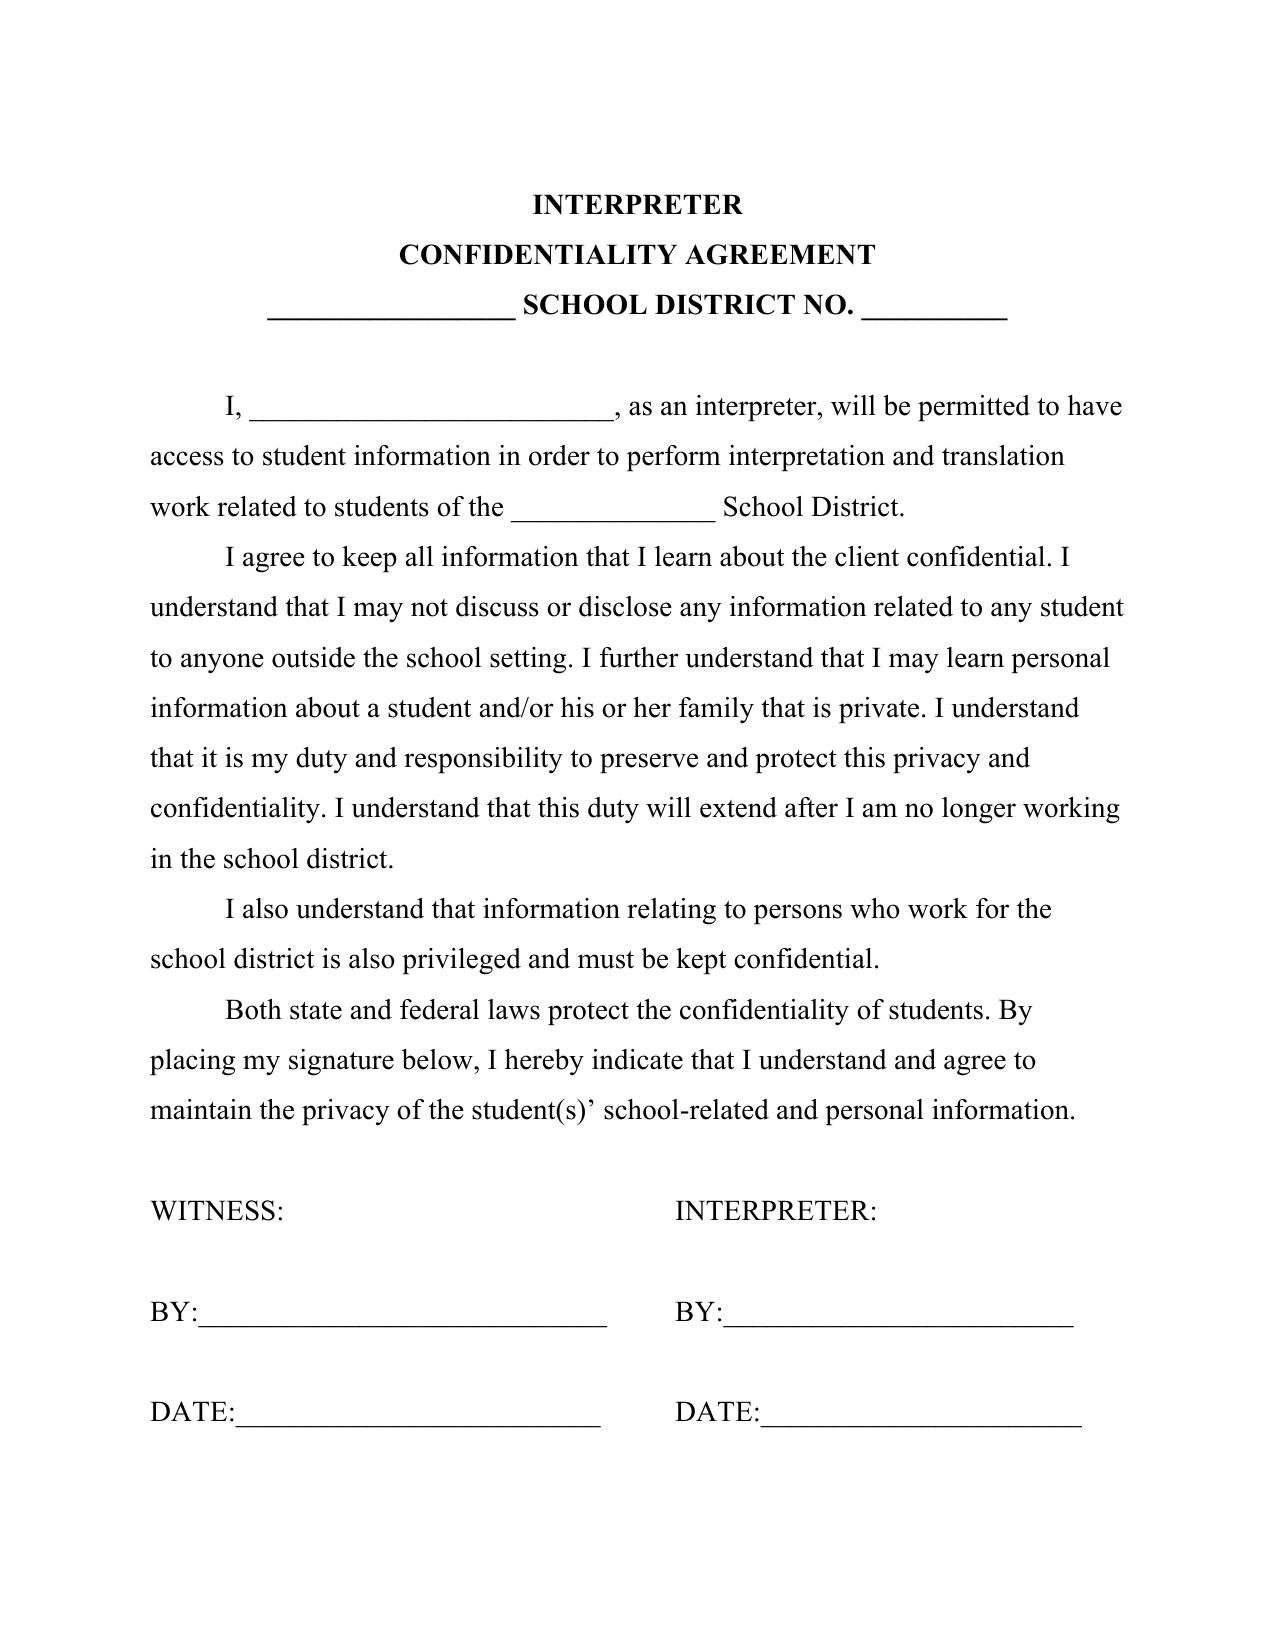 Interpreter Confidentiality Agreement School District No